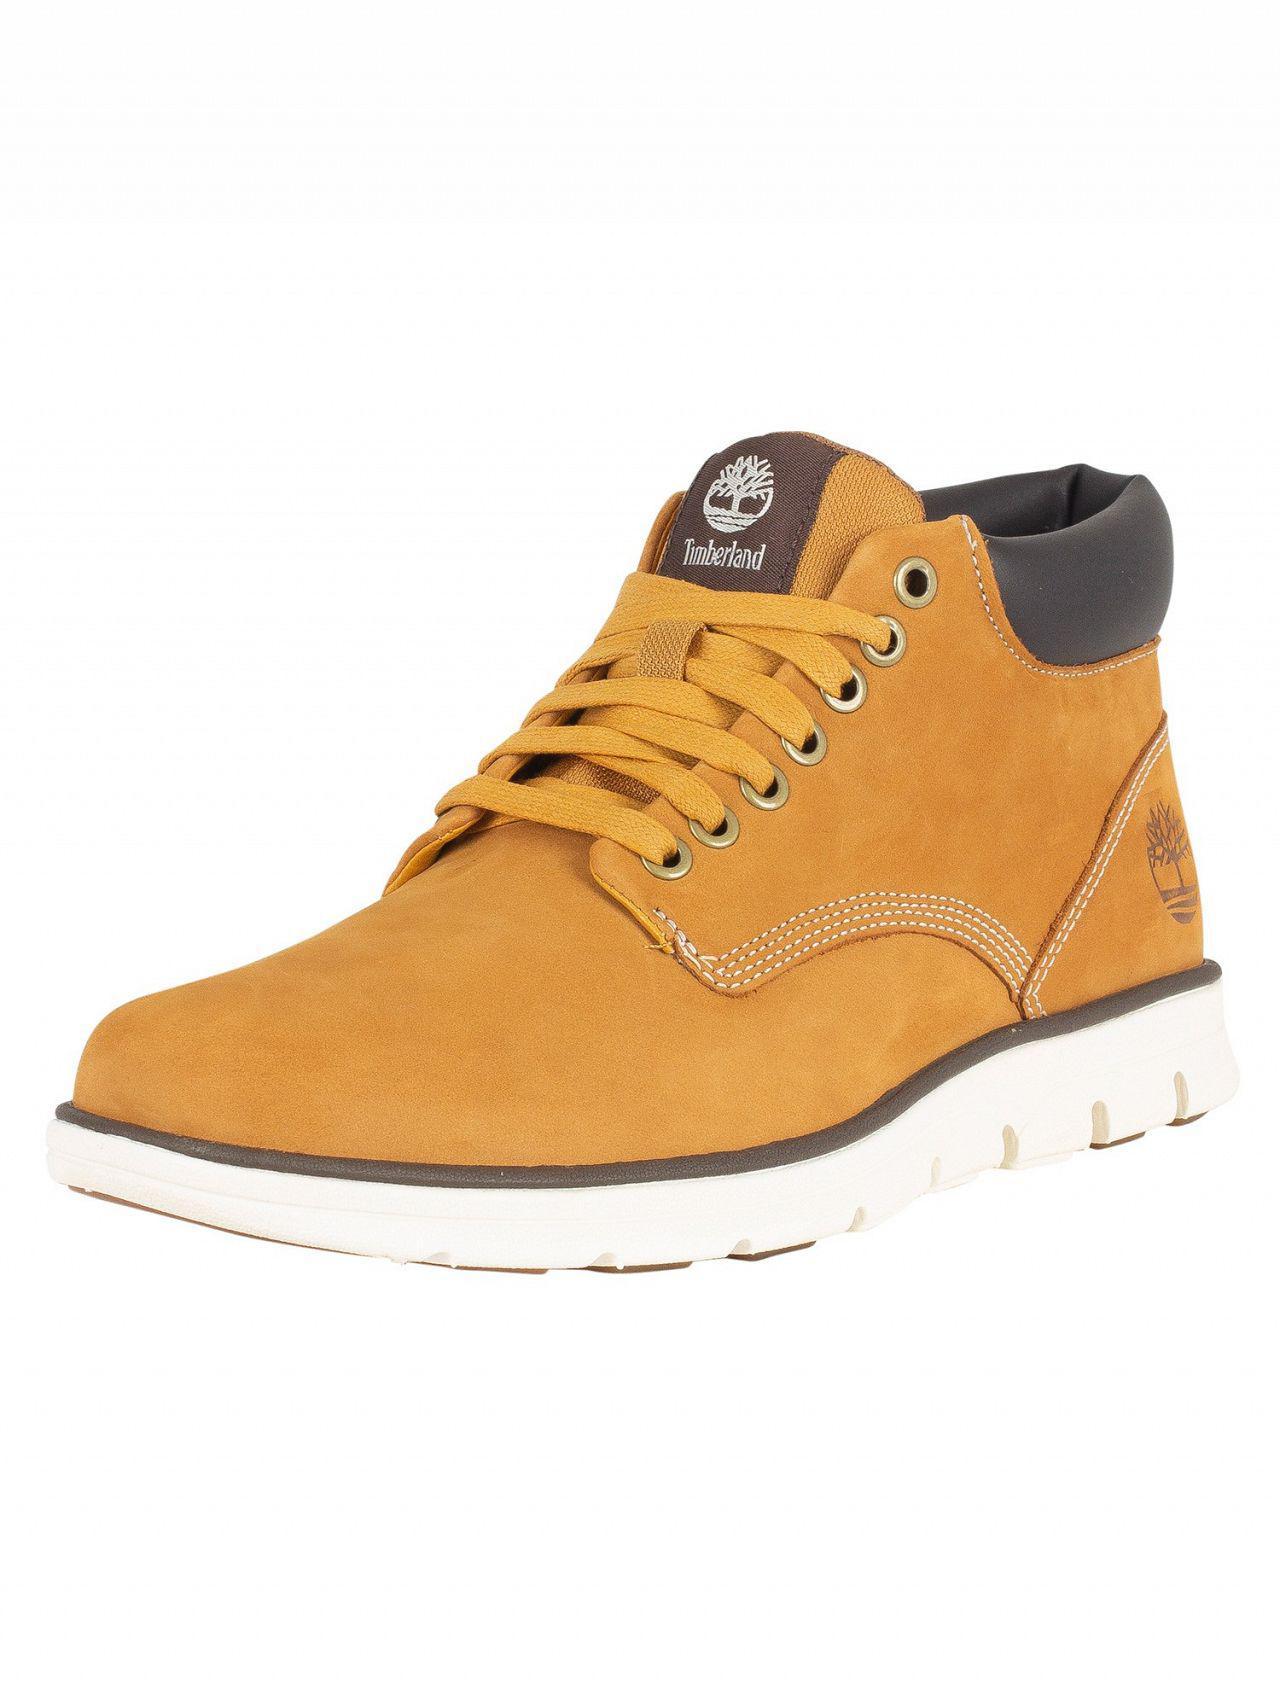 Men's Bradstreet Chukka Boots Yellow